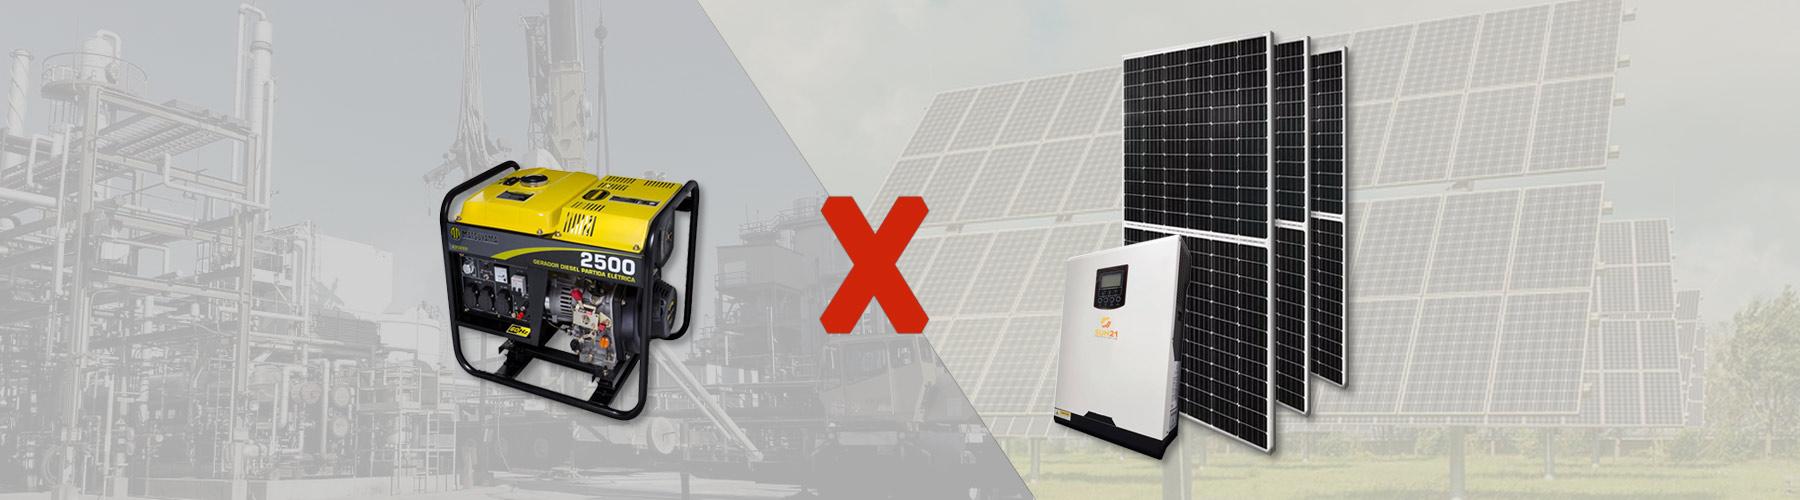 Geradores de energia solar ou à diesel?